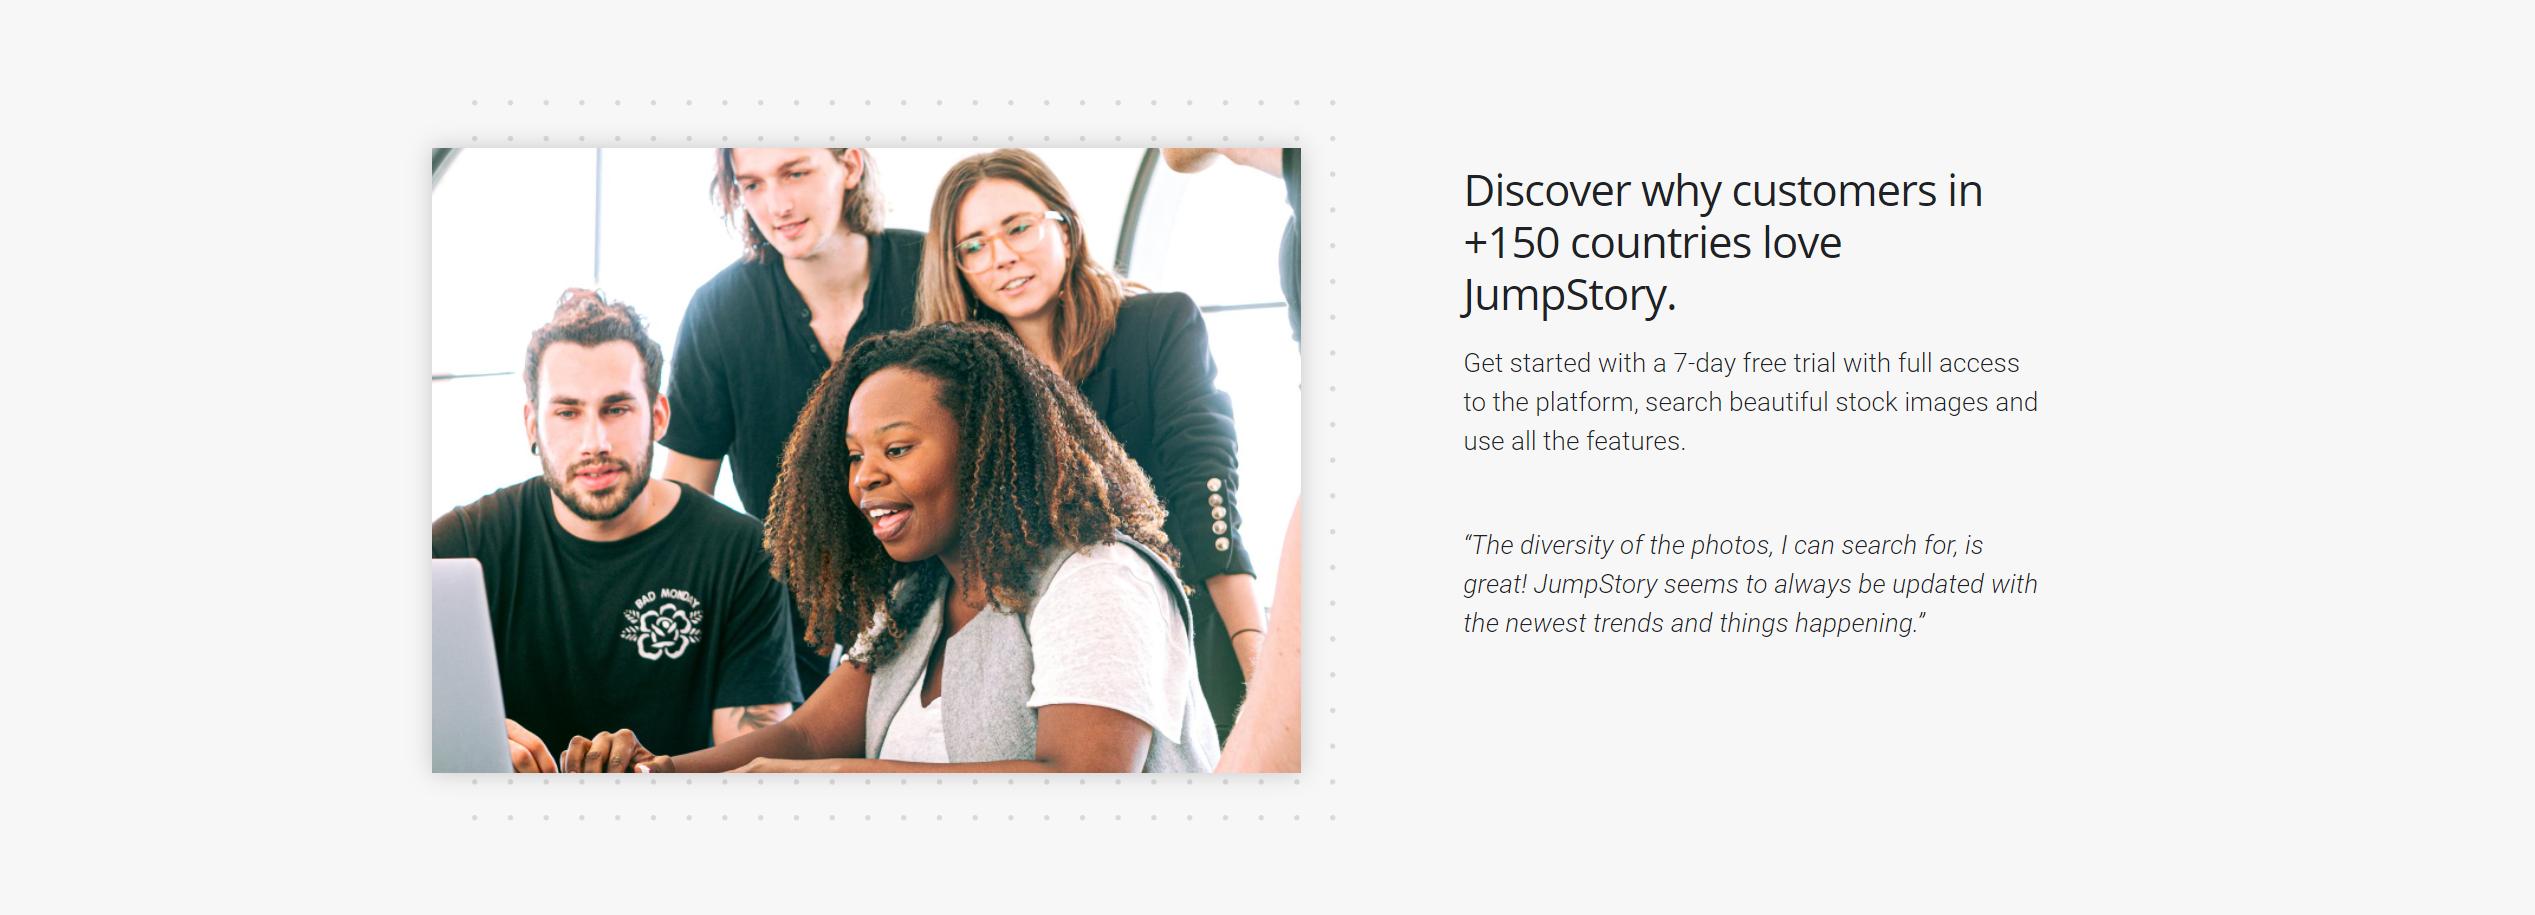 JumpStory Software - 5